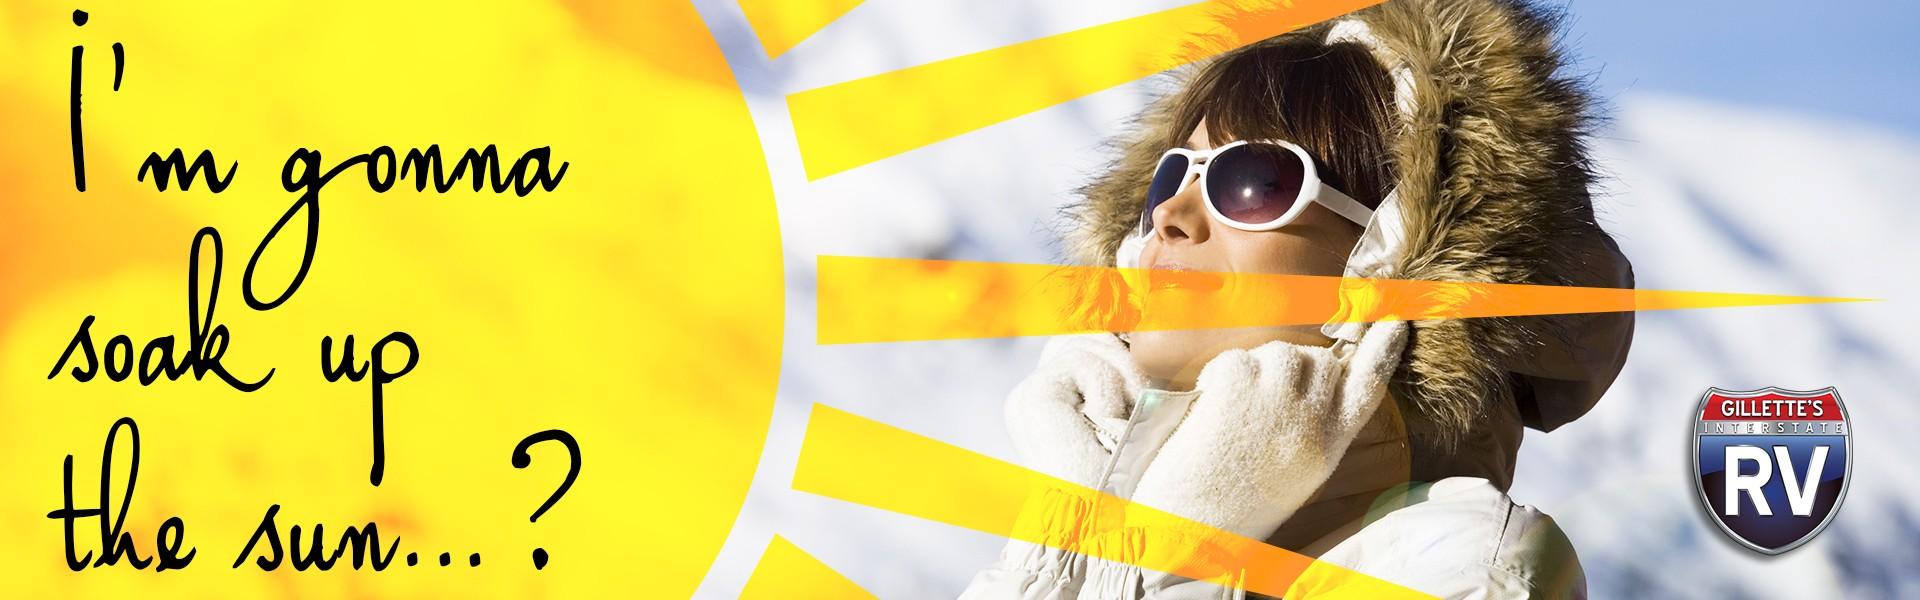 I'm gonna soak up the sun…? Woman sunbathing in winter